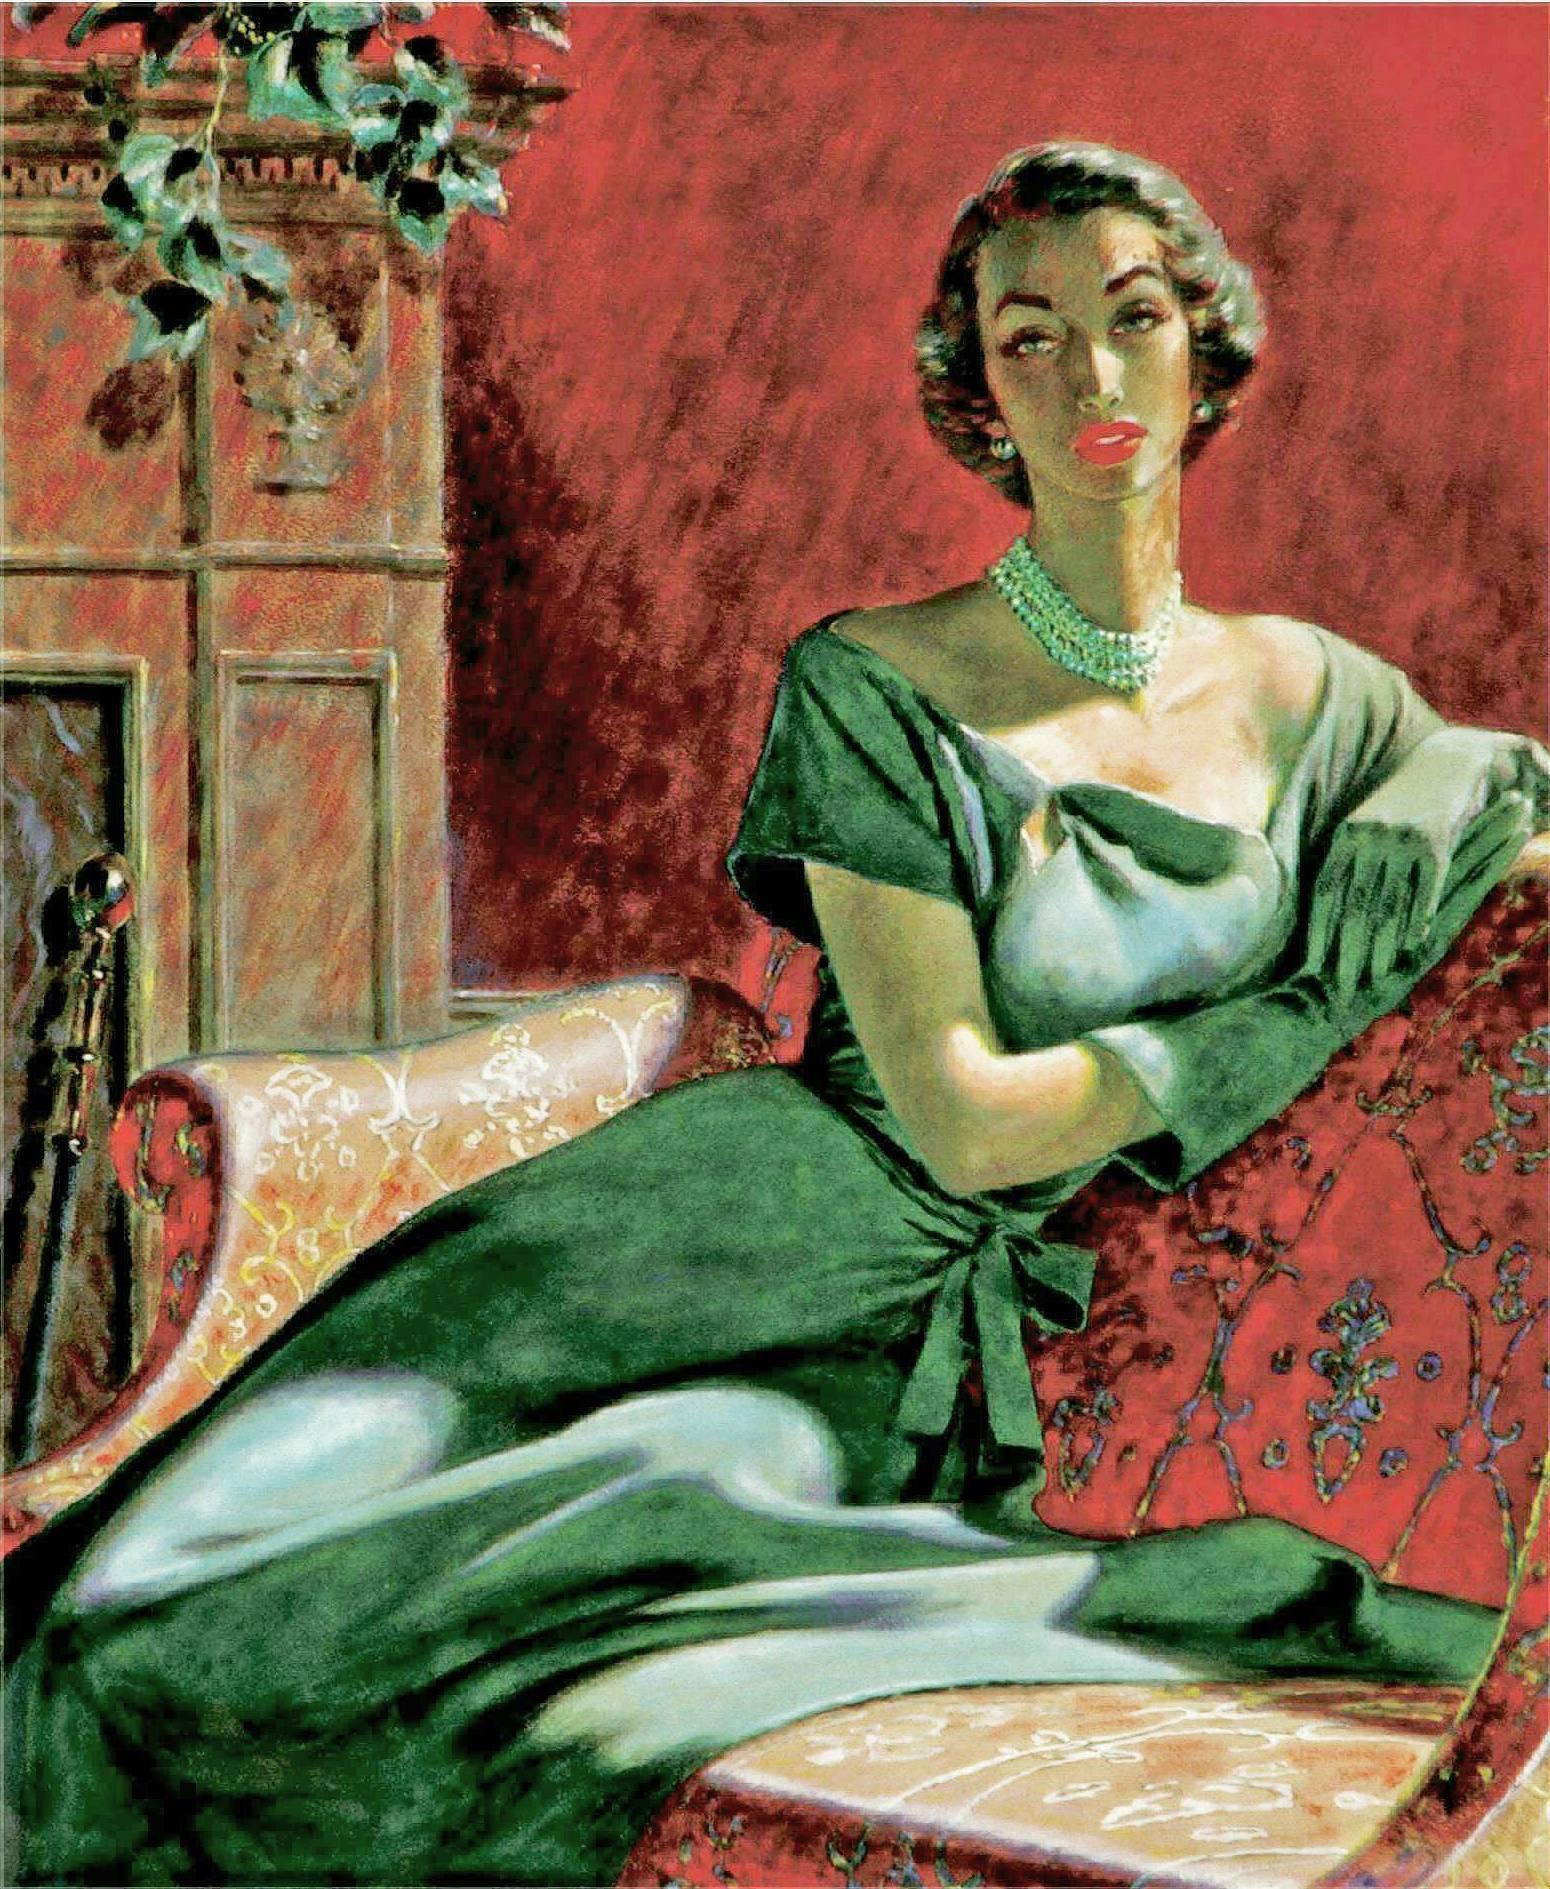 Portrait of a Woman, Woman's Magazine Illustration Mid Century